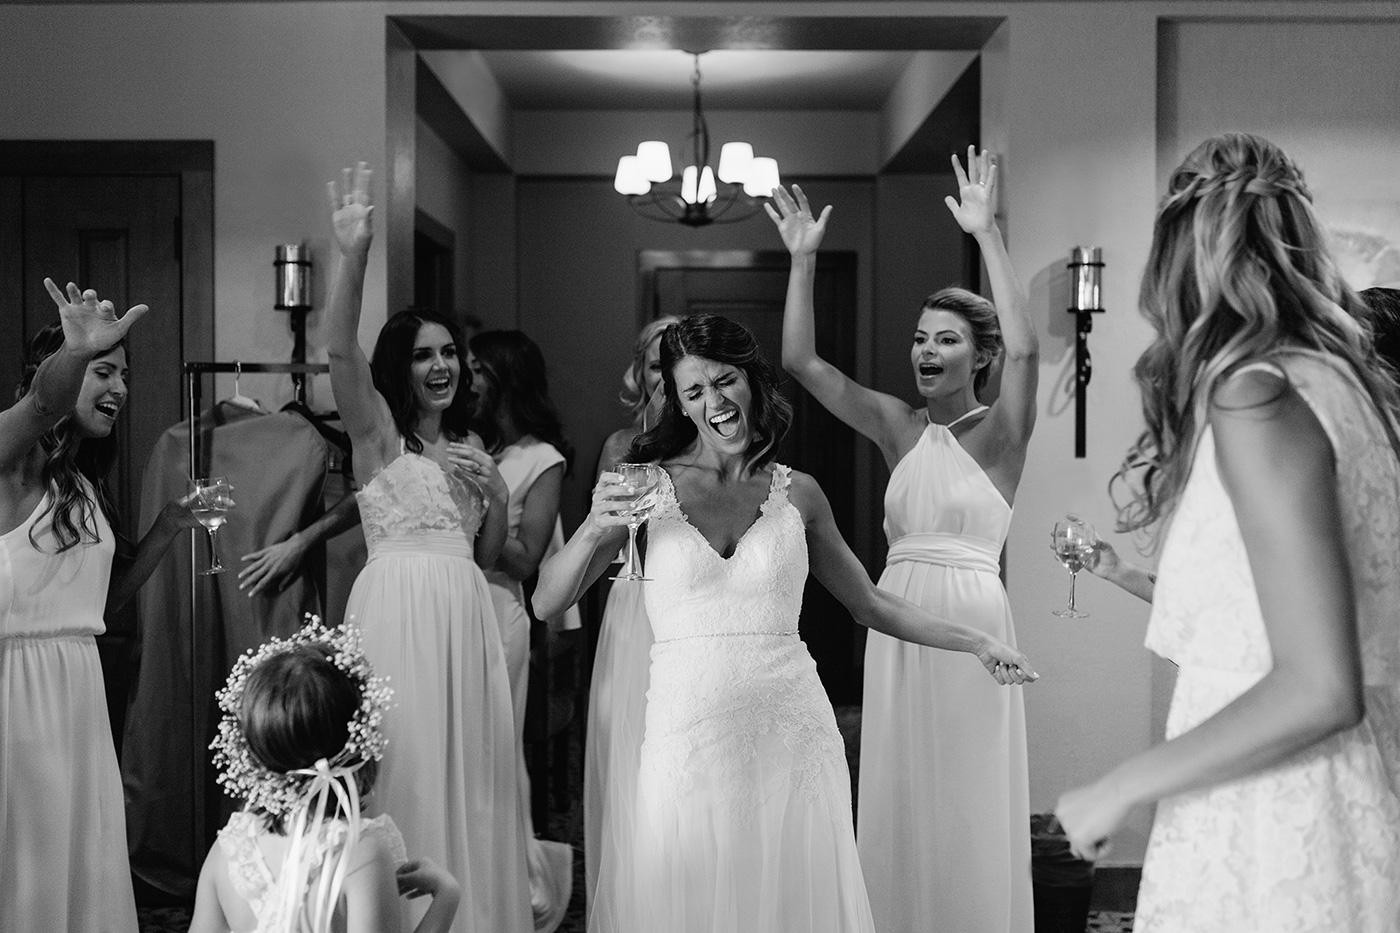 bridesmaids-dancing-together-web.jpg